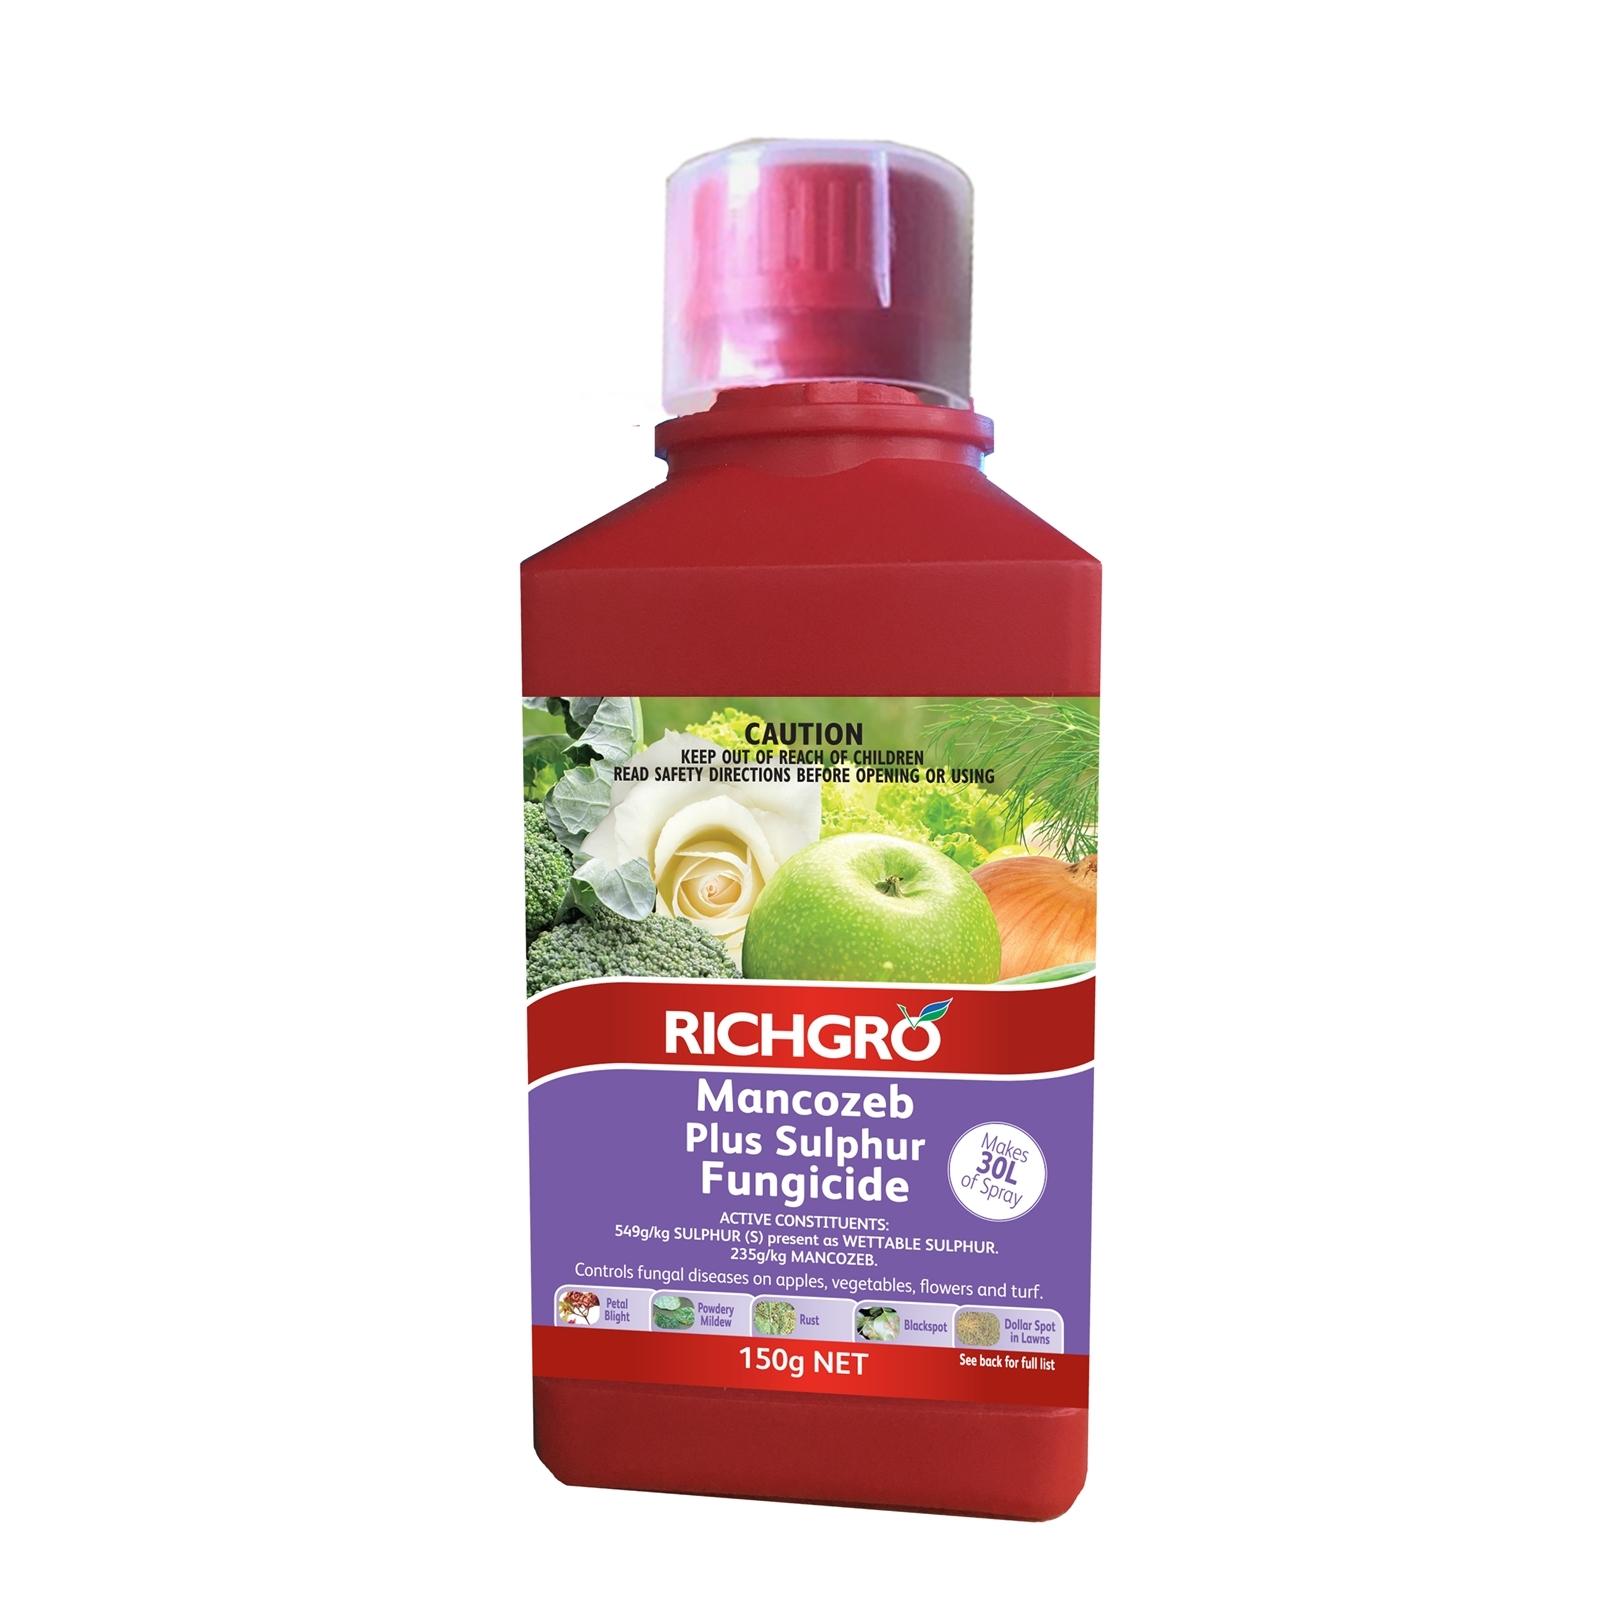 Richgro 150g Mancozeb Fungicide